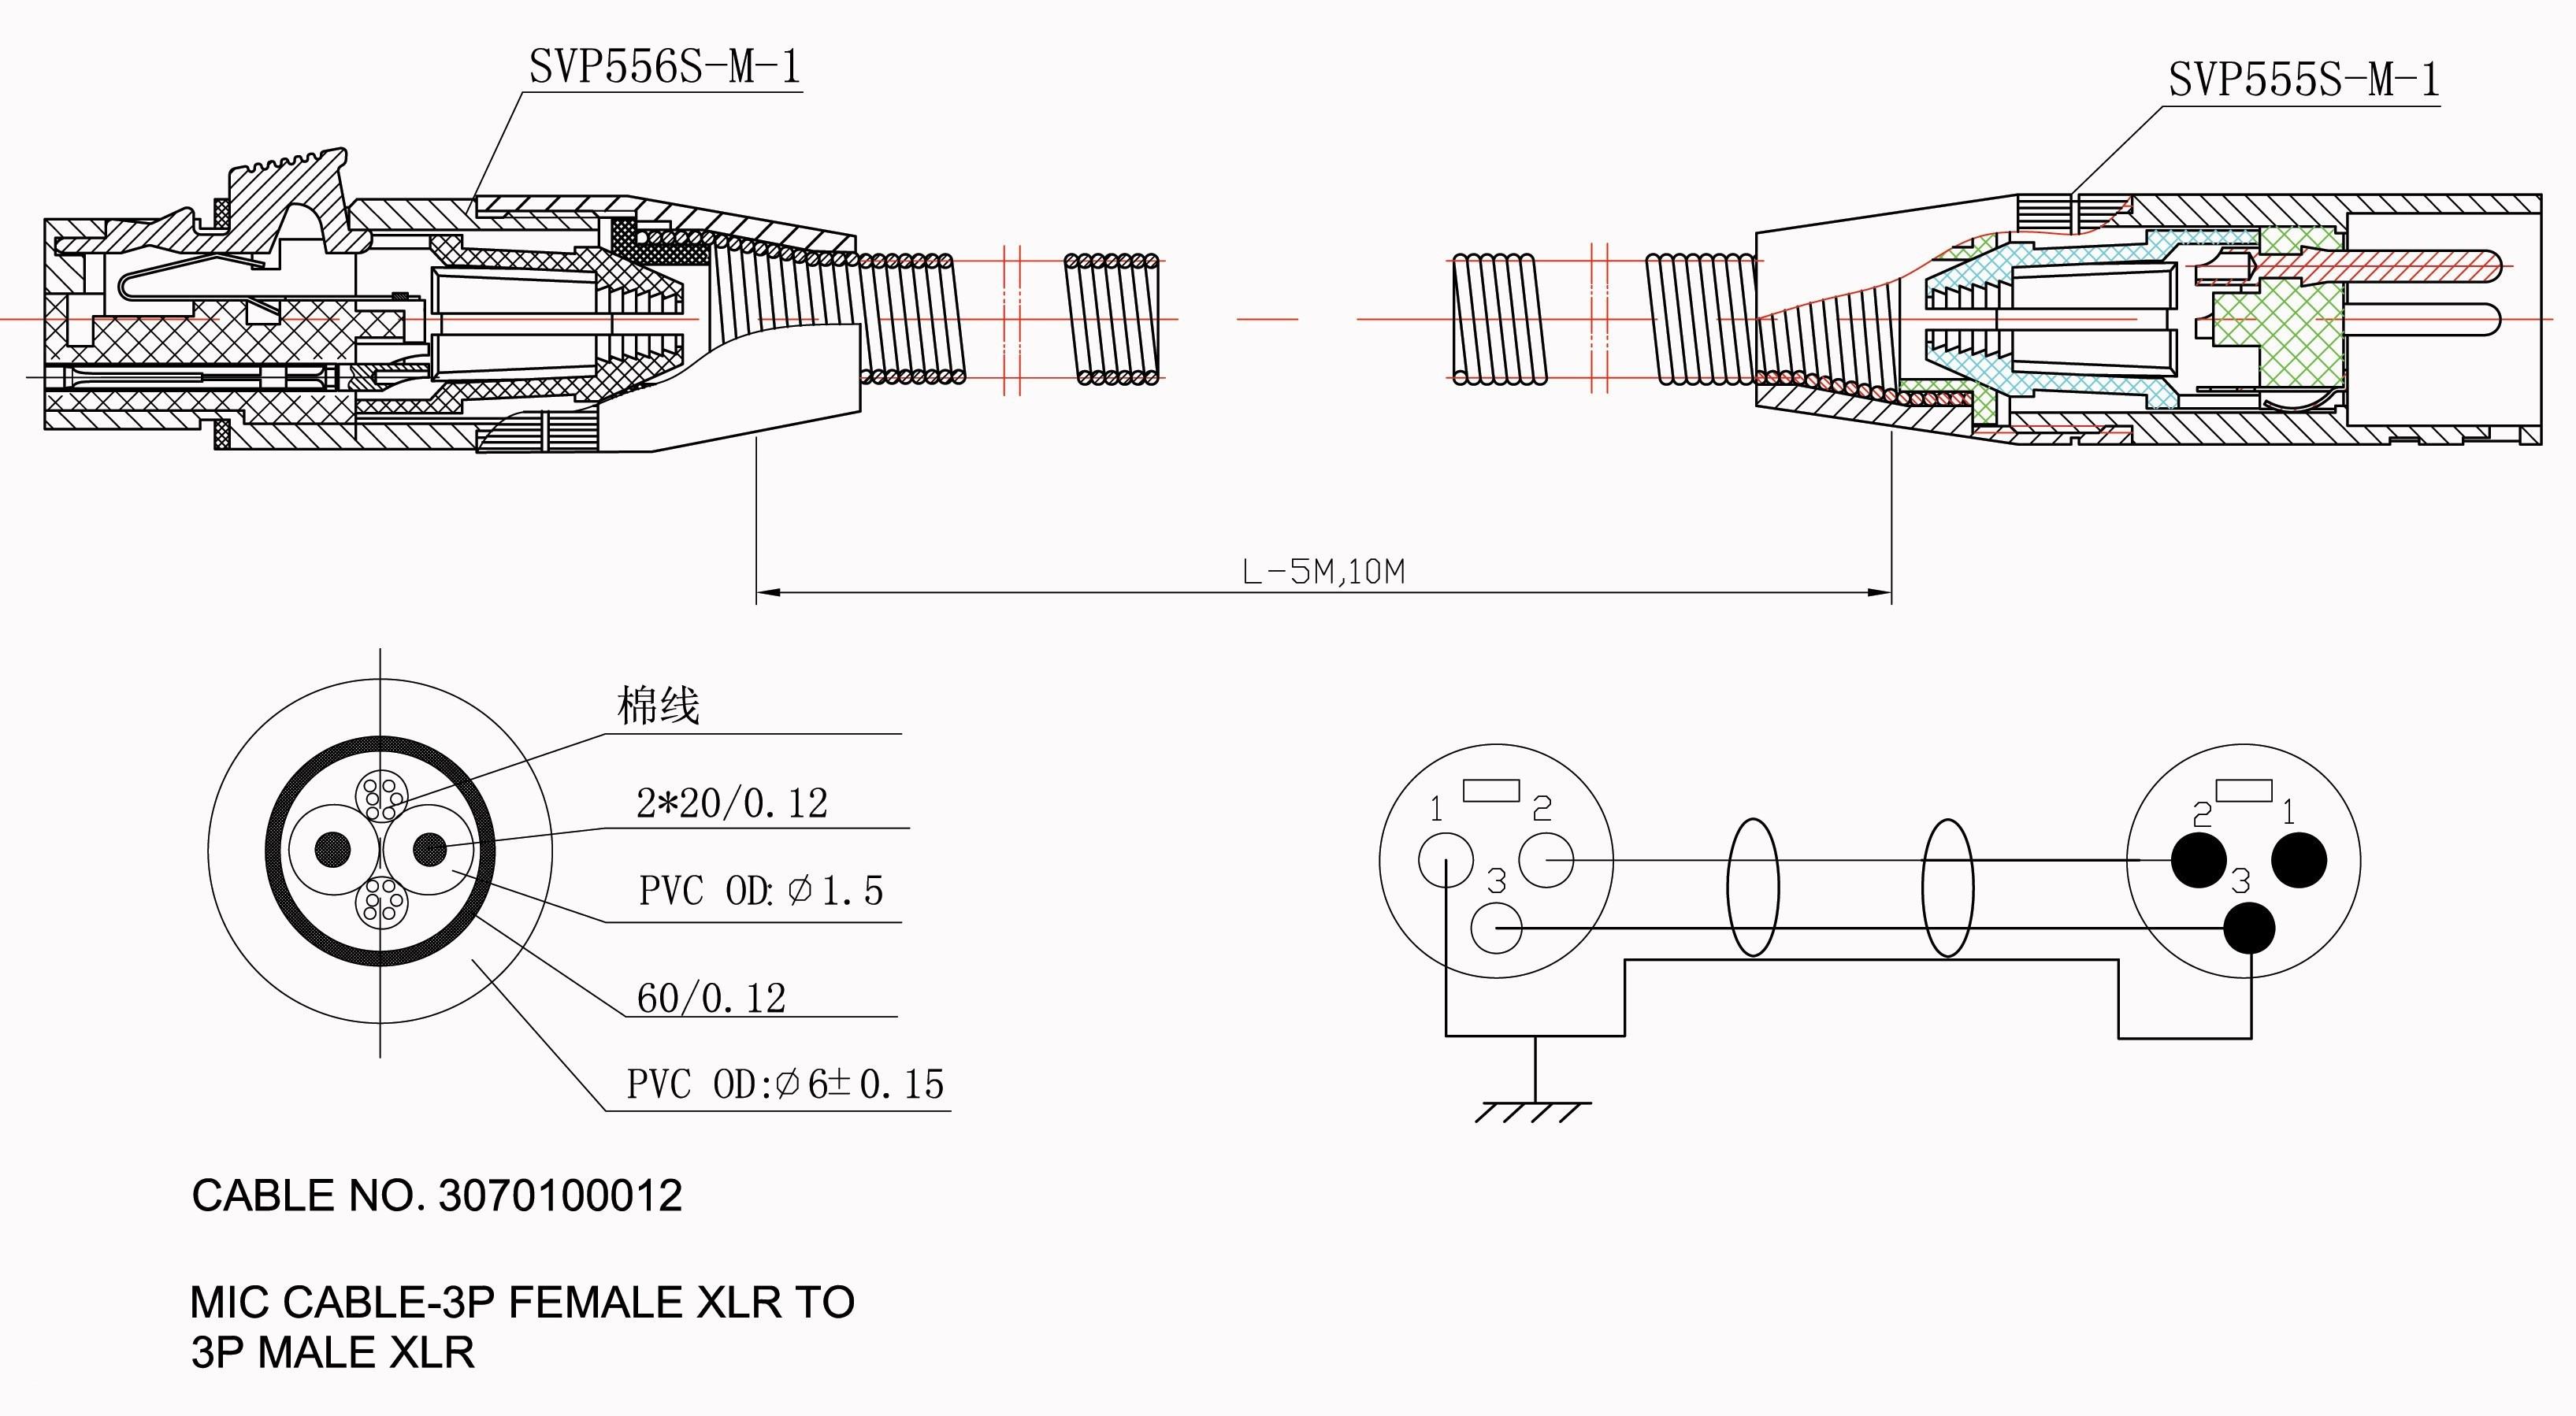 Cy 5606 Crutchfield Wiring Guide Crutchfield Circuit Diagrams Wiring Diagram